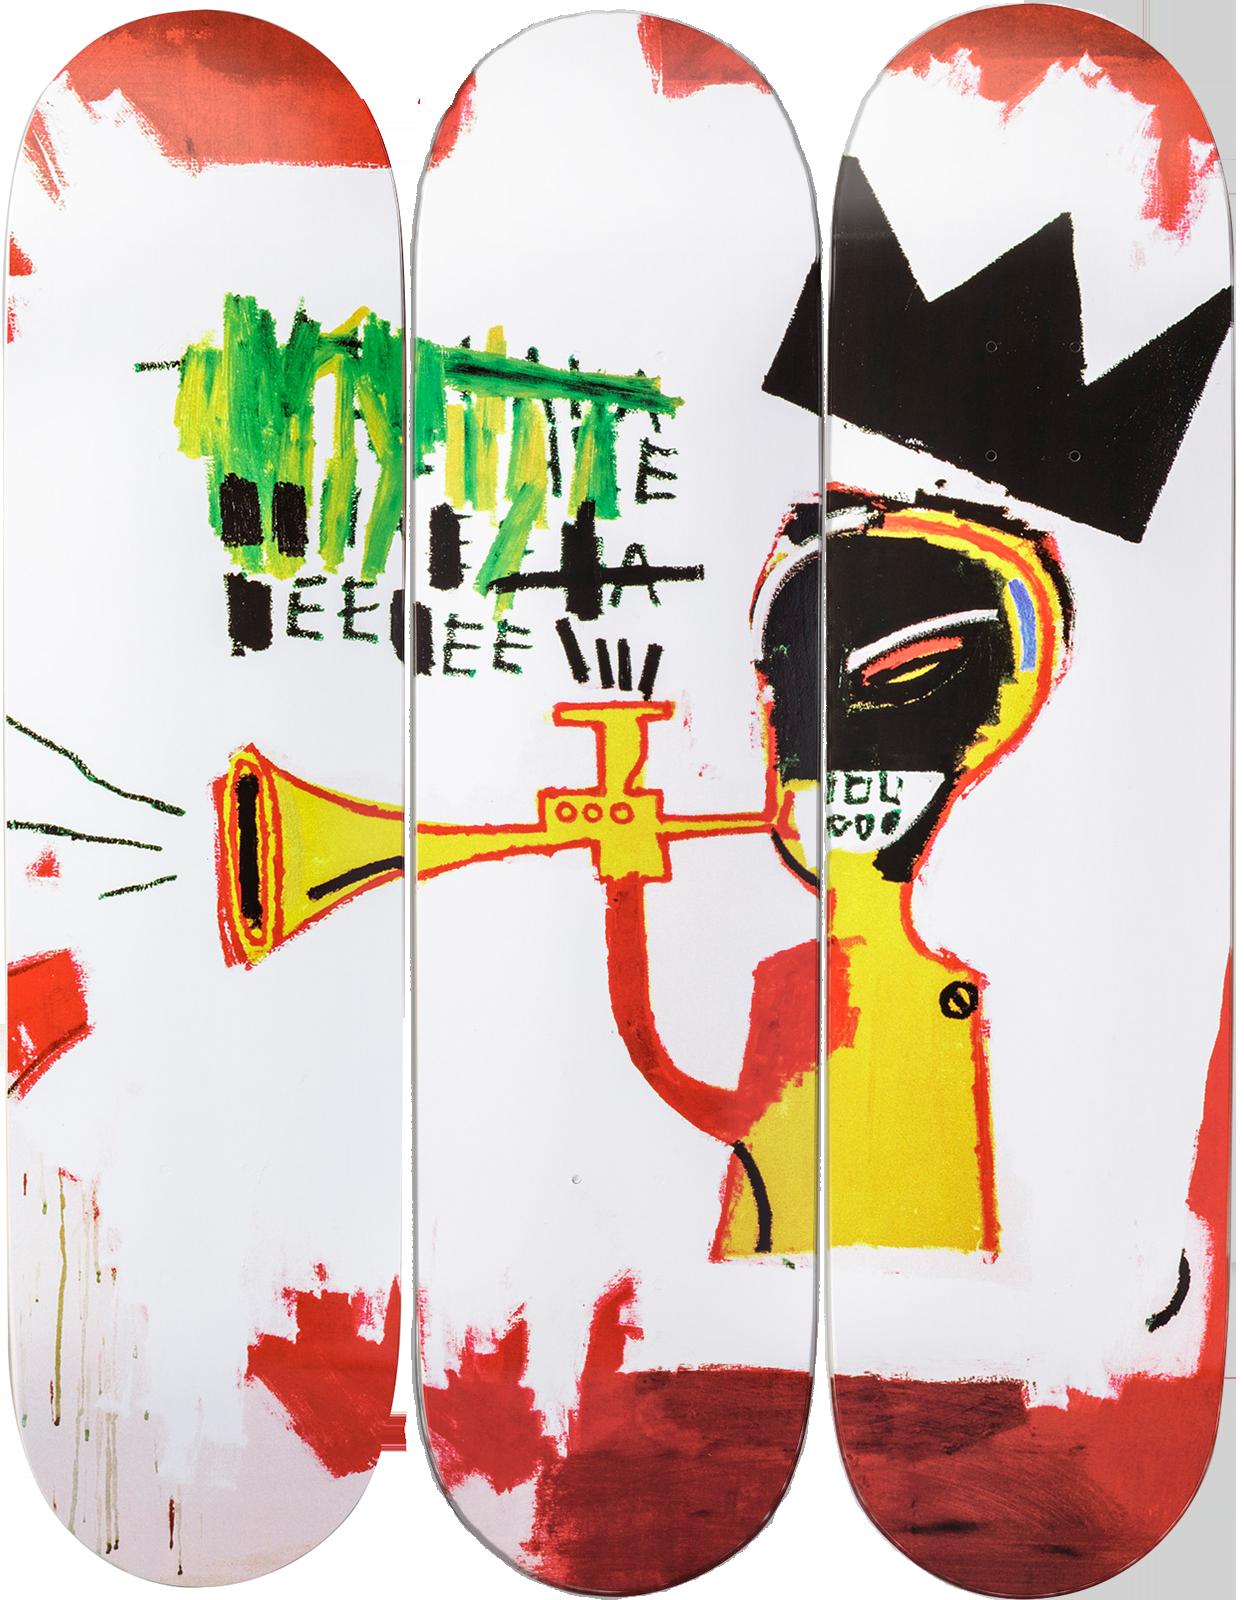 Trumpet - Jean - Michel Basquiat